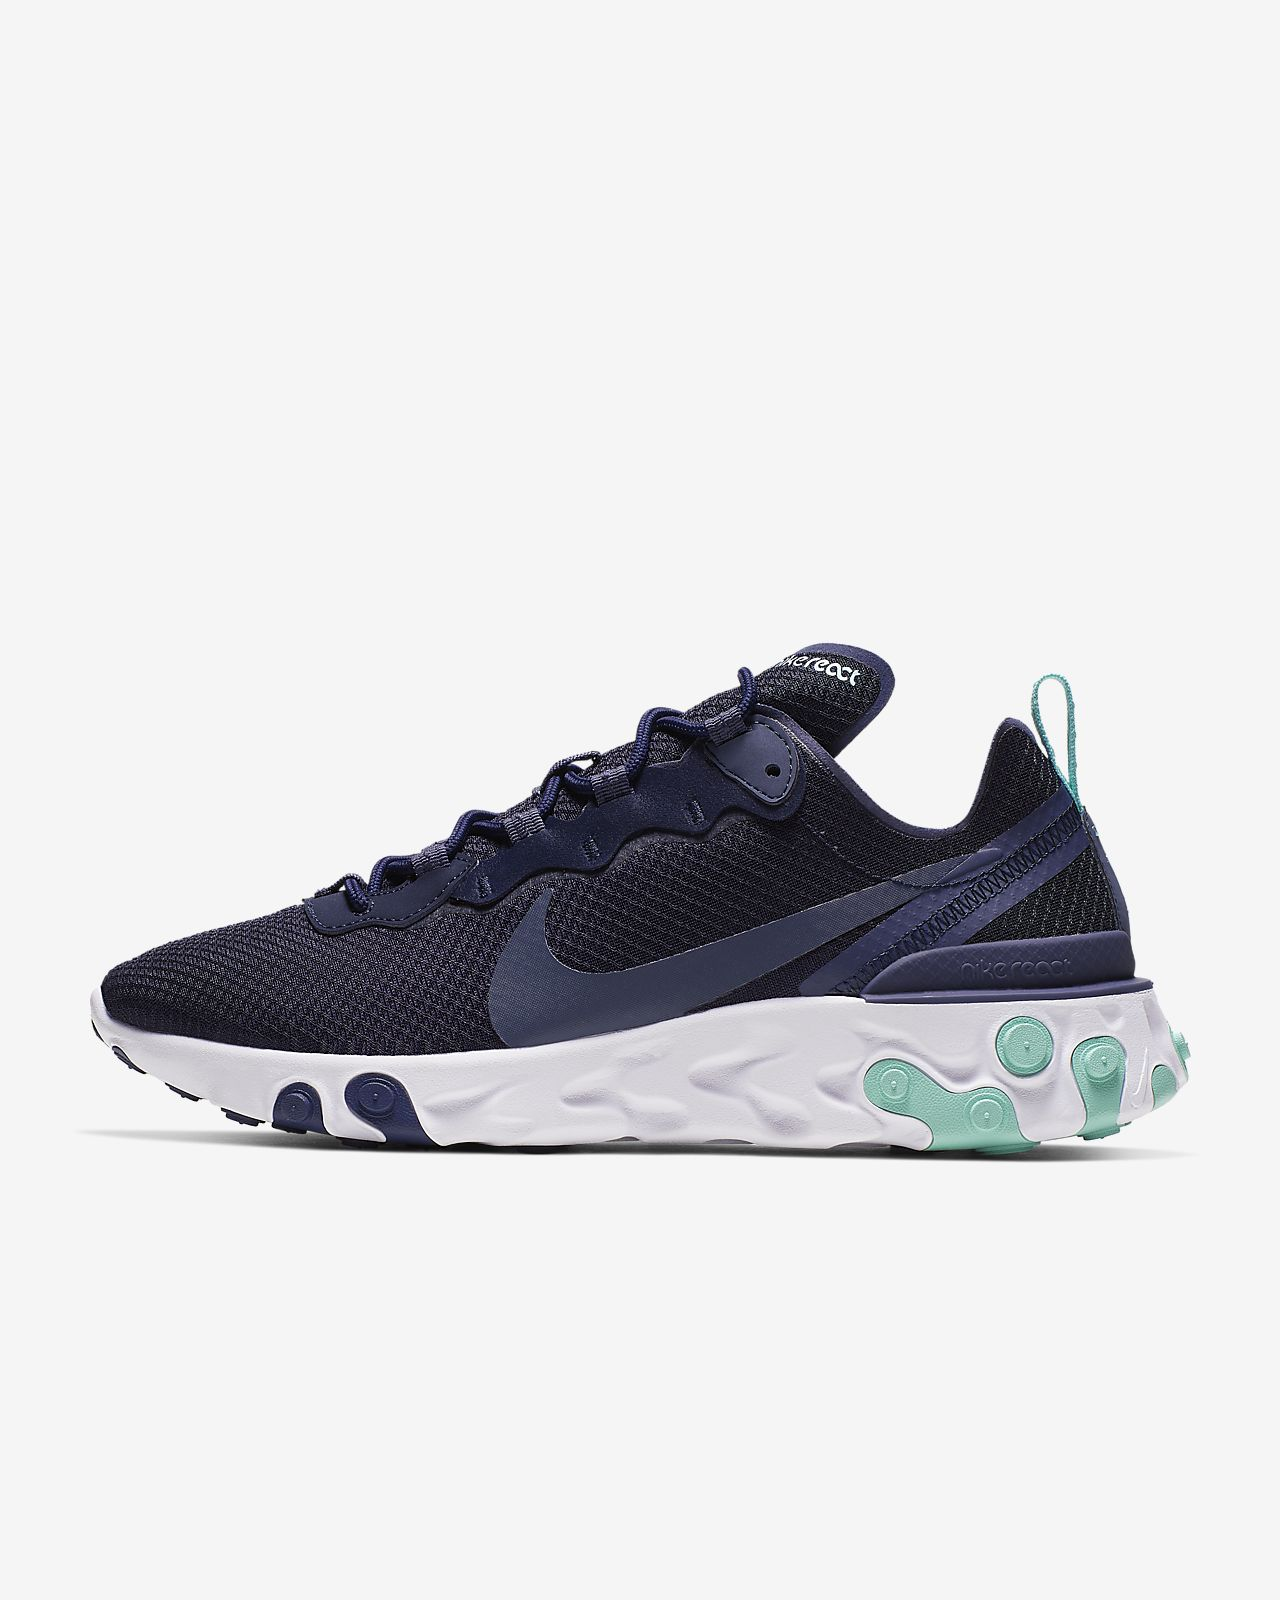 44cb8c5708da Nike React Element 55 Men s Shoe. Nike.com GB